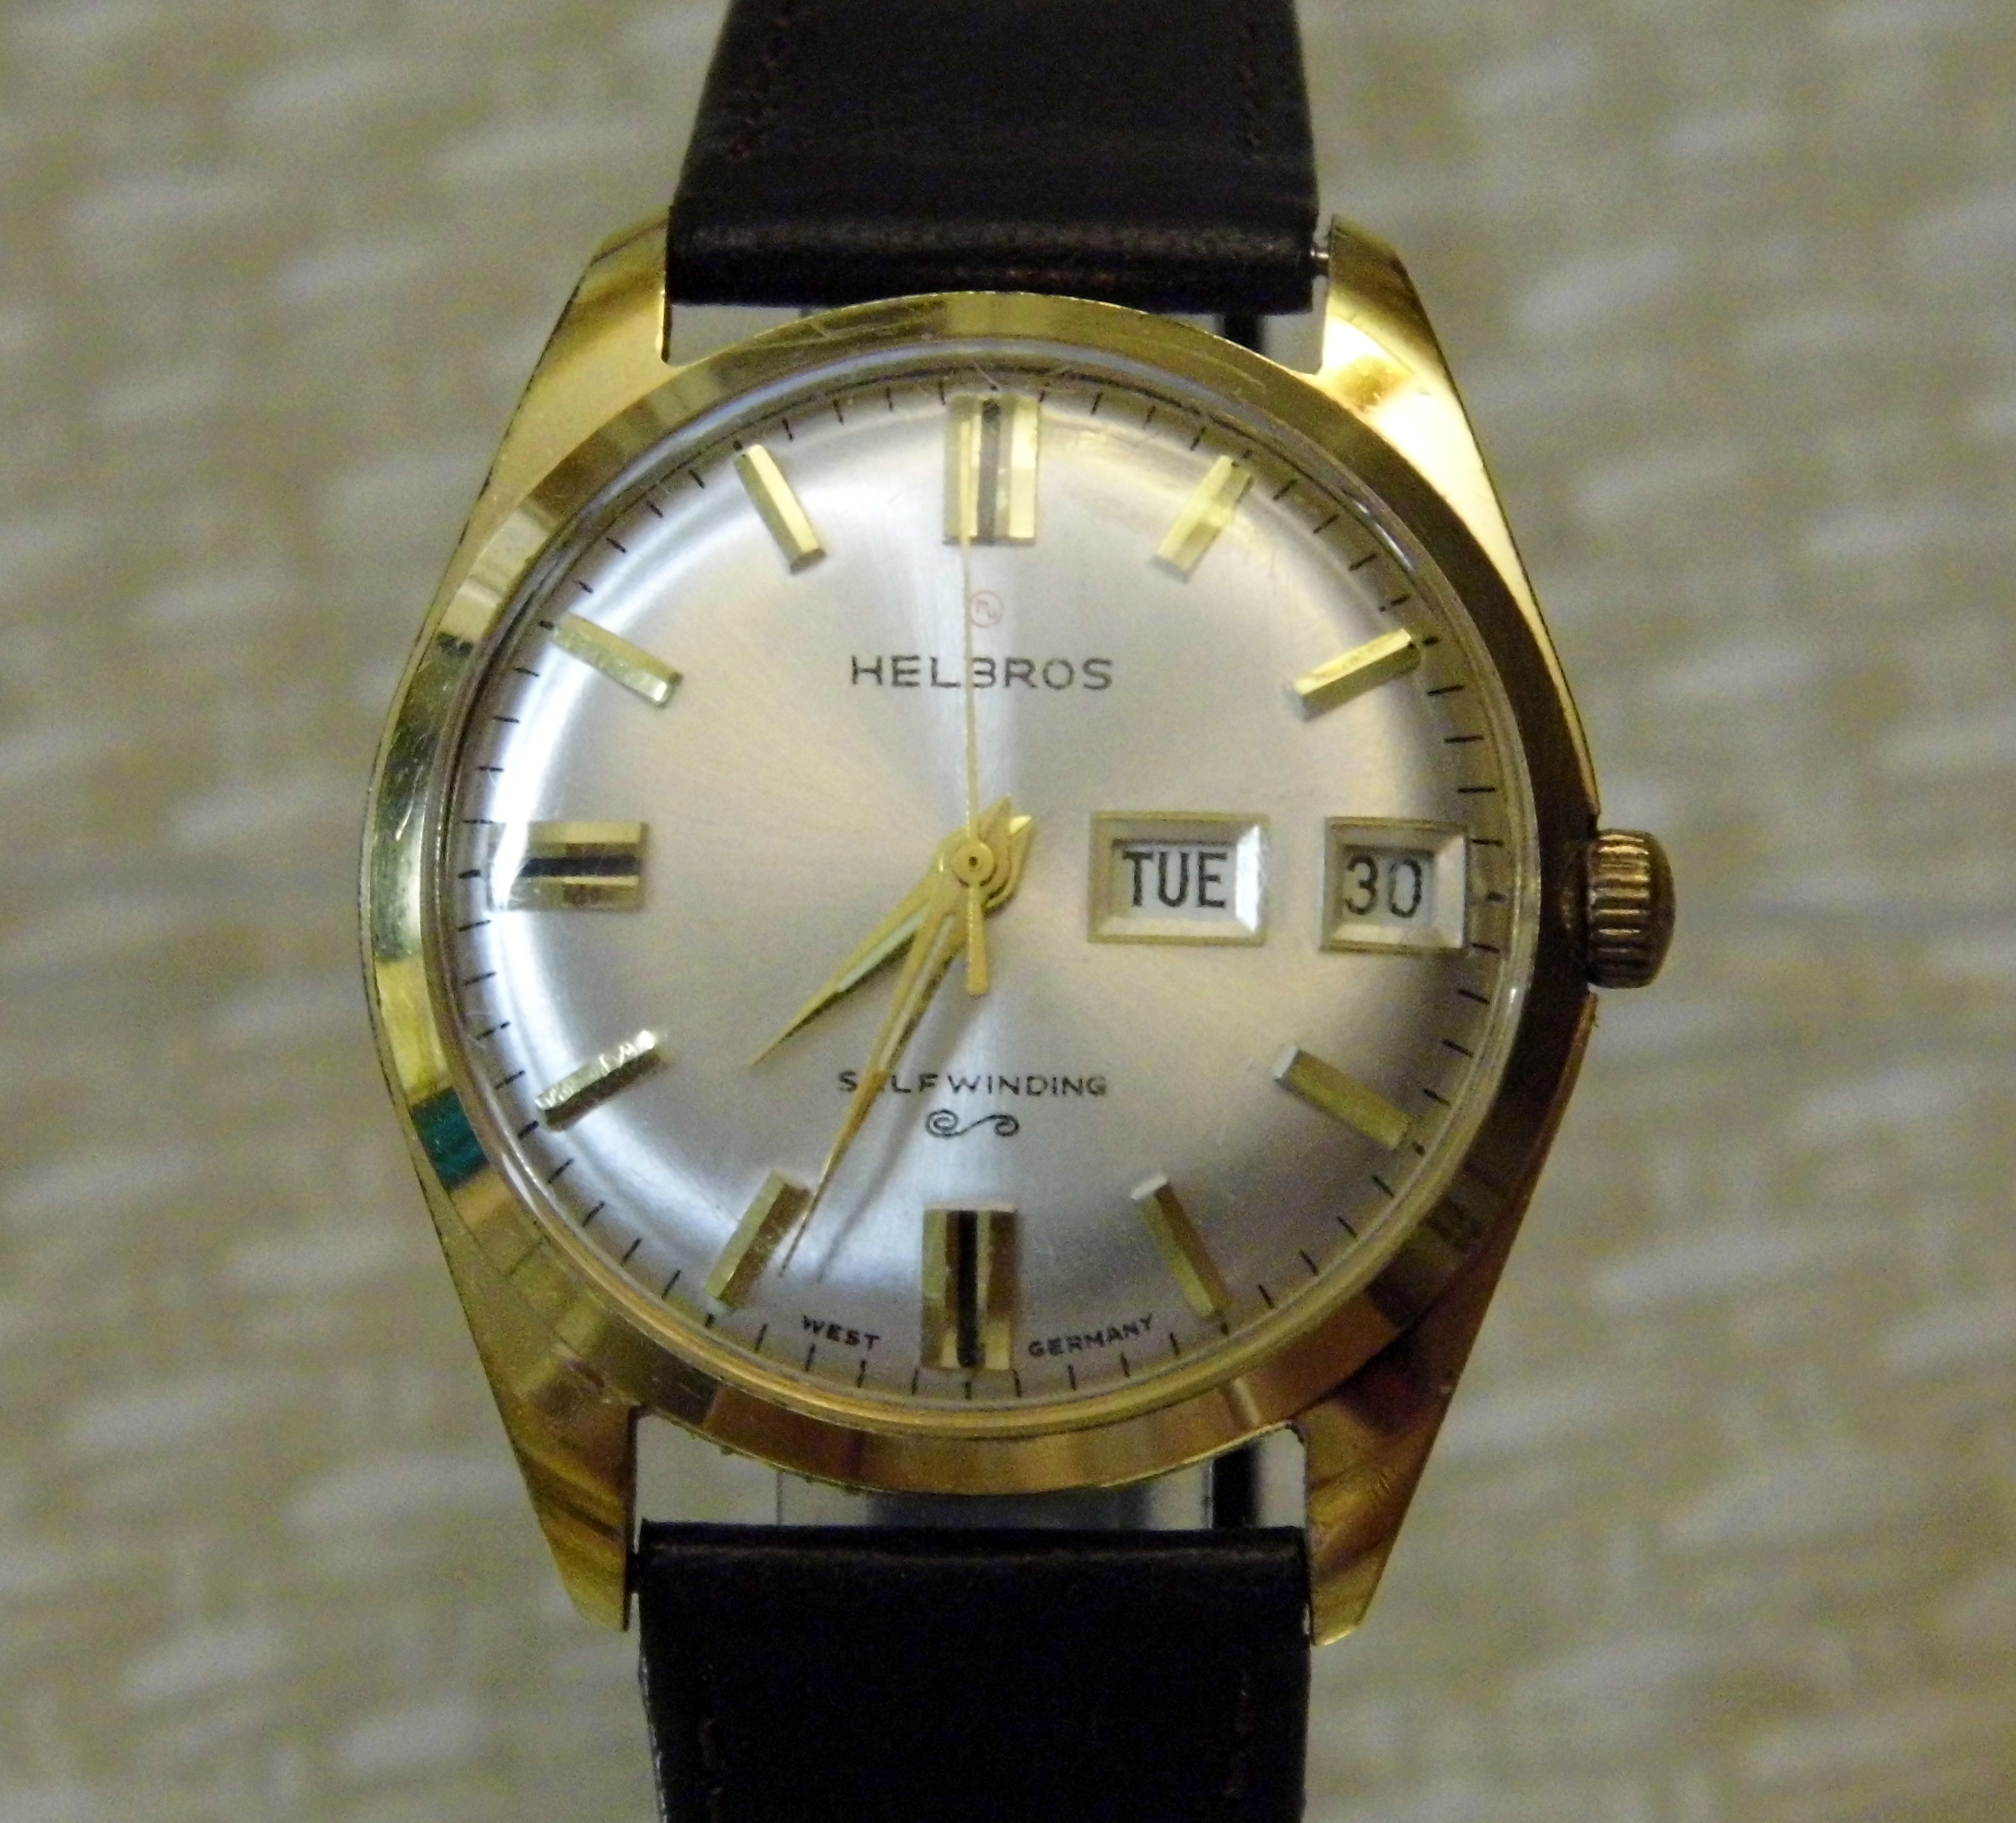 filevintage helbros automatic selfwinding watch made